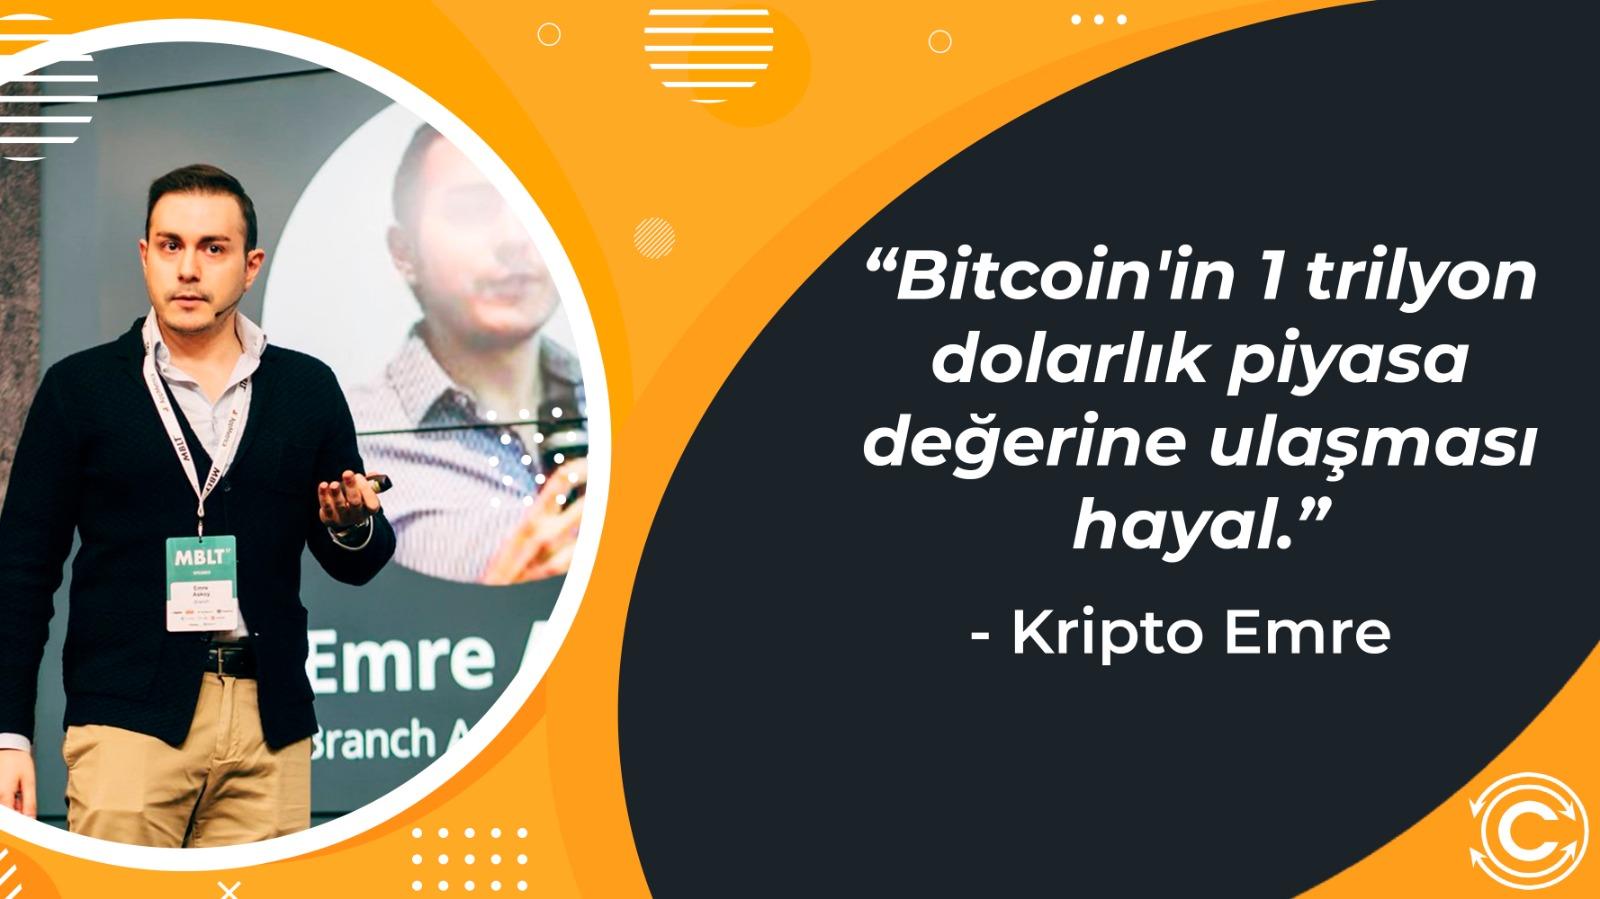 Kripto Emreden Bitcoin BTC ve Altcoin Piyasasina Dair Guncel Aciklamalar